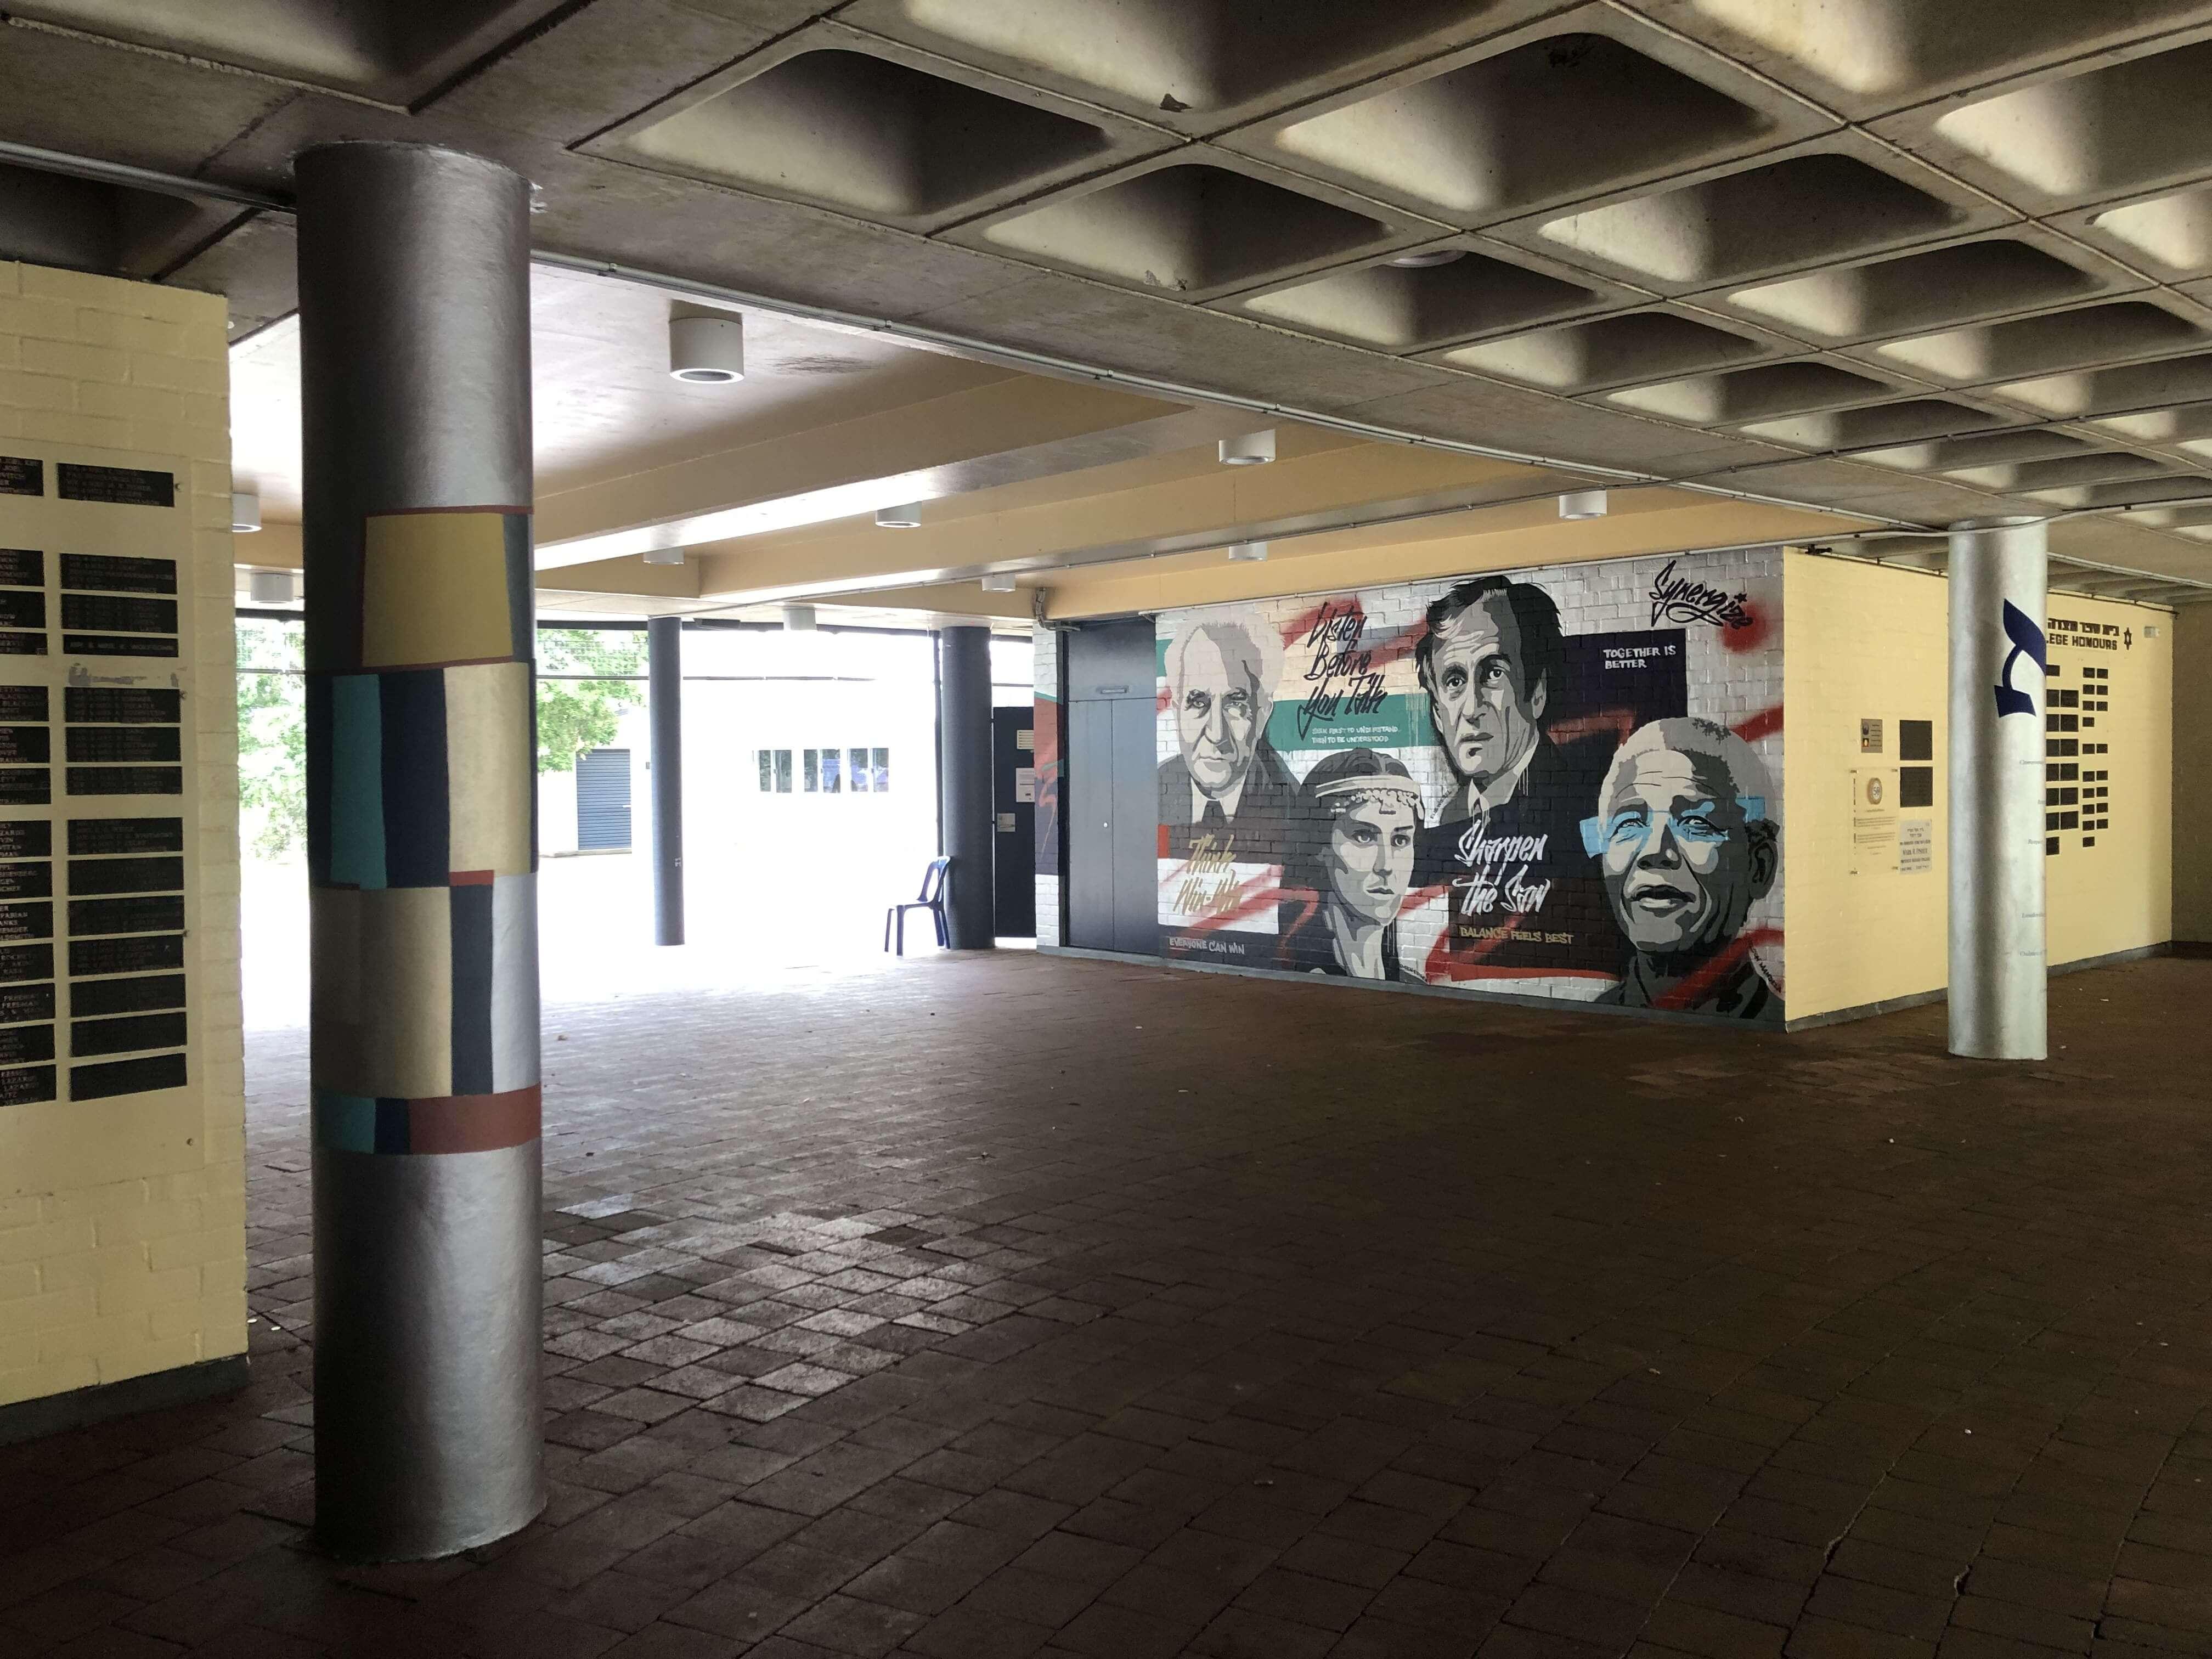 the-art-of-wall-masada-mural-stencil-leaders-seven-habits-wall-art-school-mural6